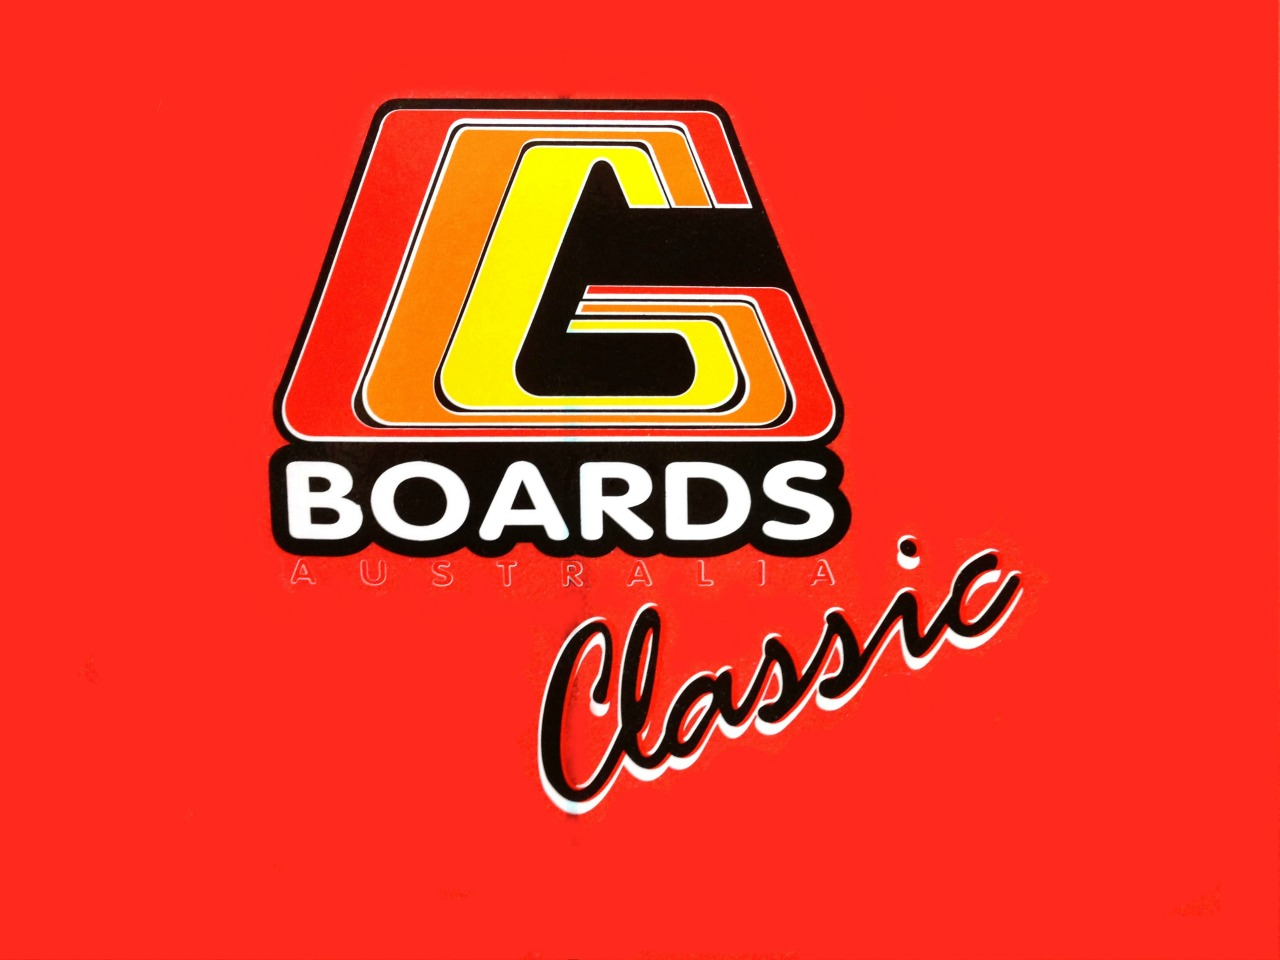 G Boards Logo 1280 x 960